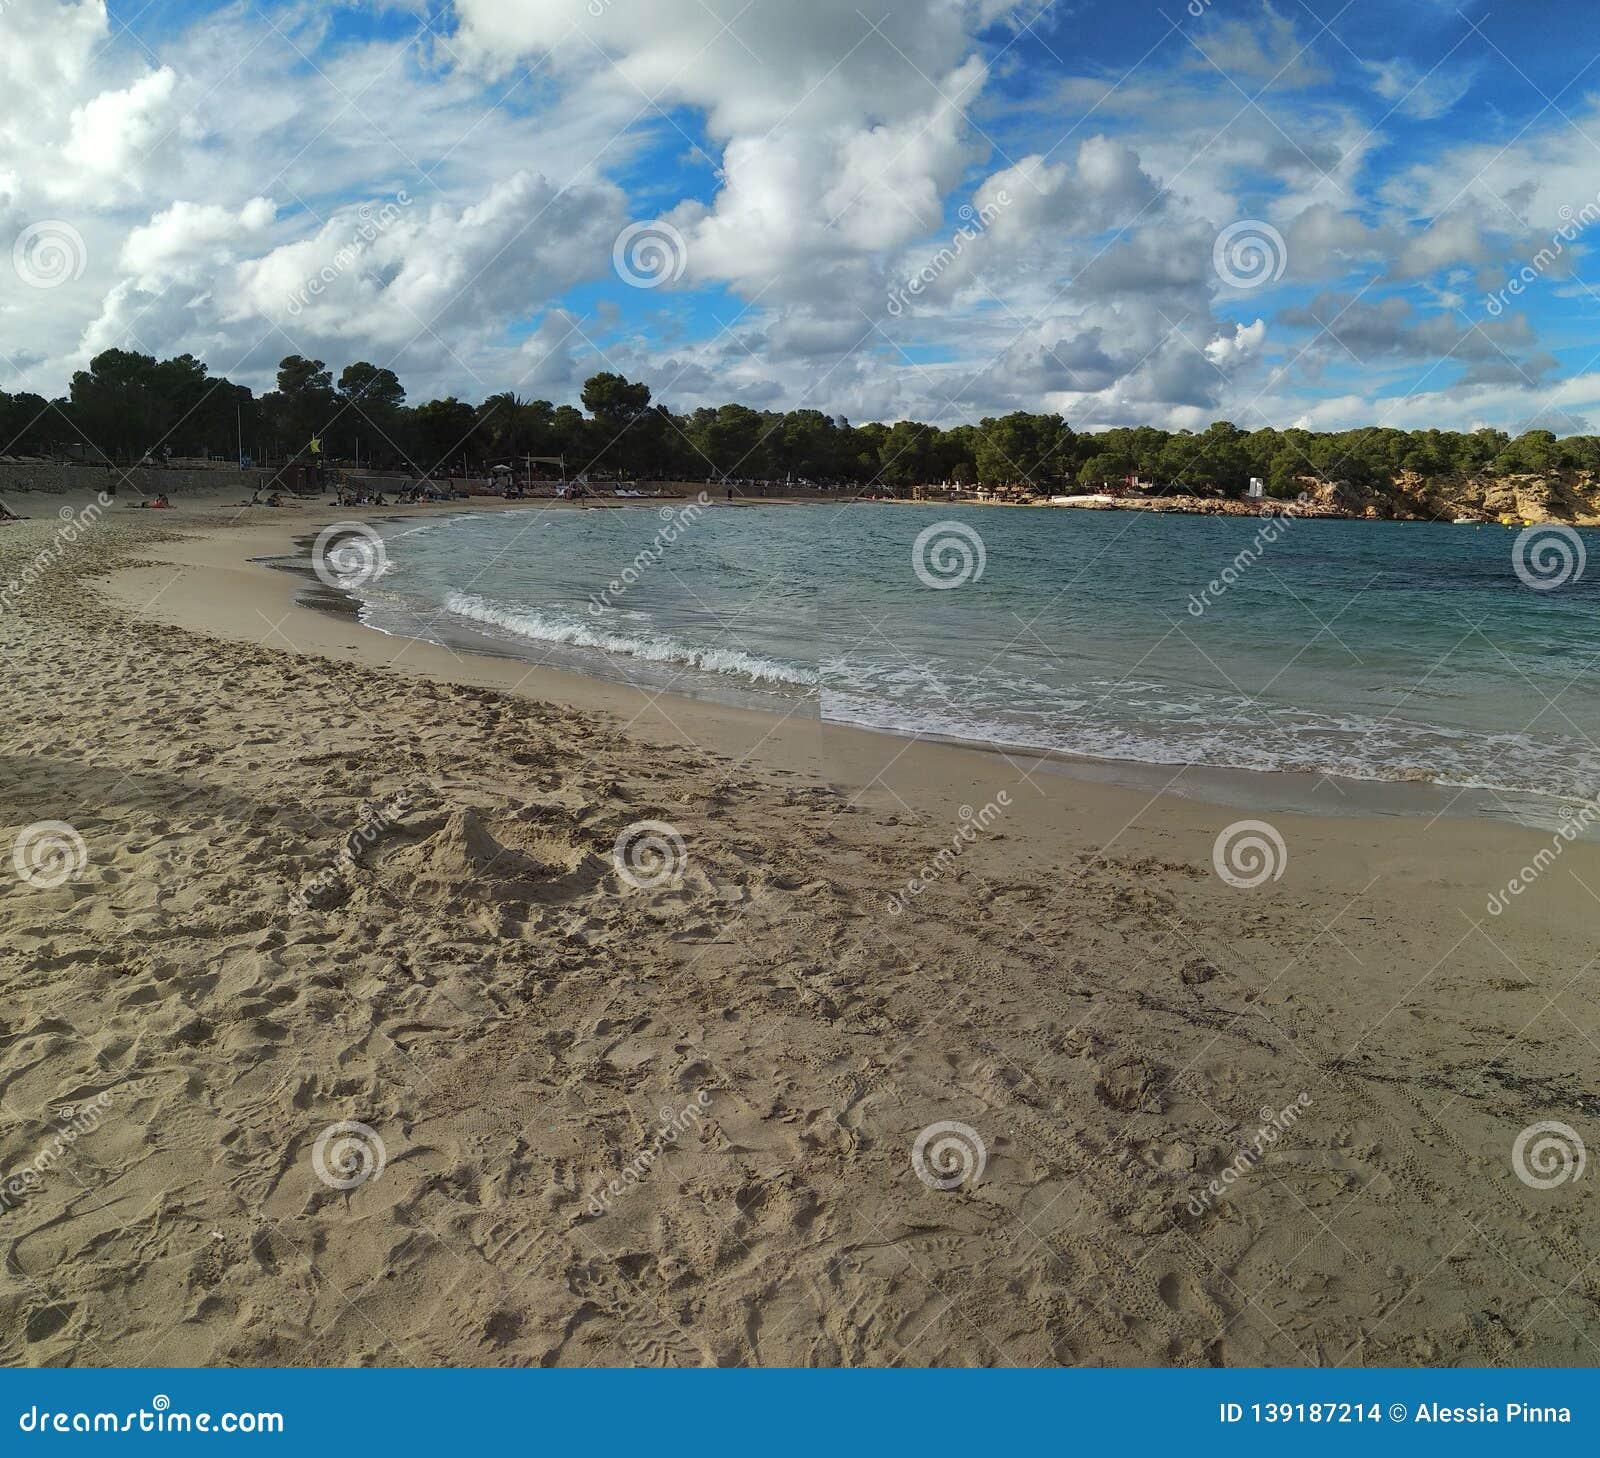 Famous Beach Of Cala Bassa In Ibiza, Pitiusa Island Of The